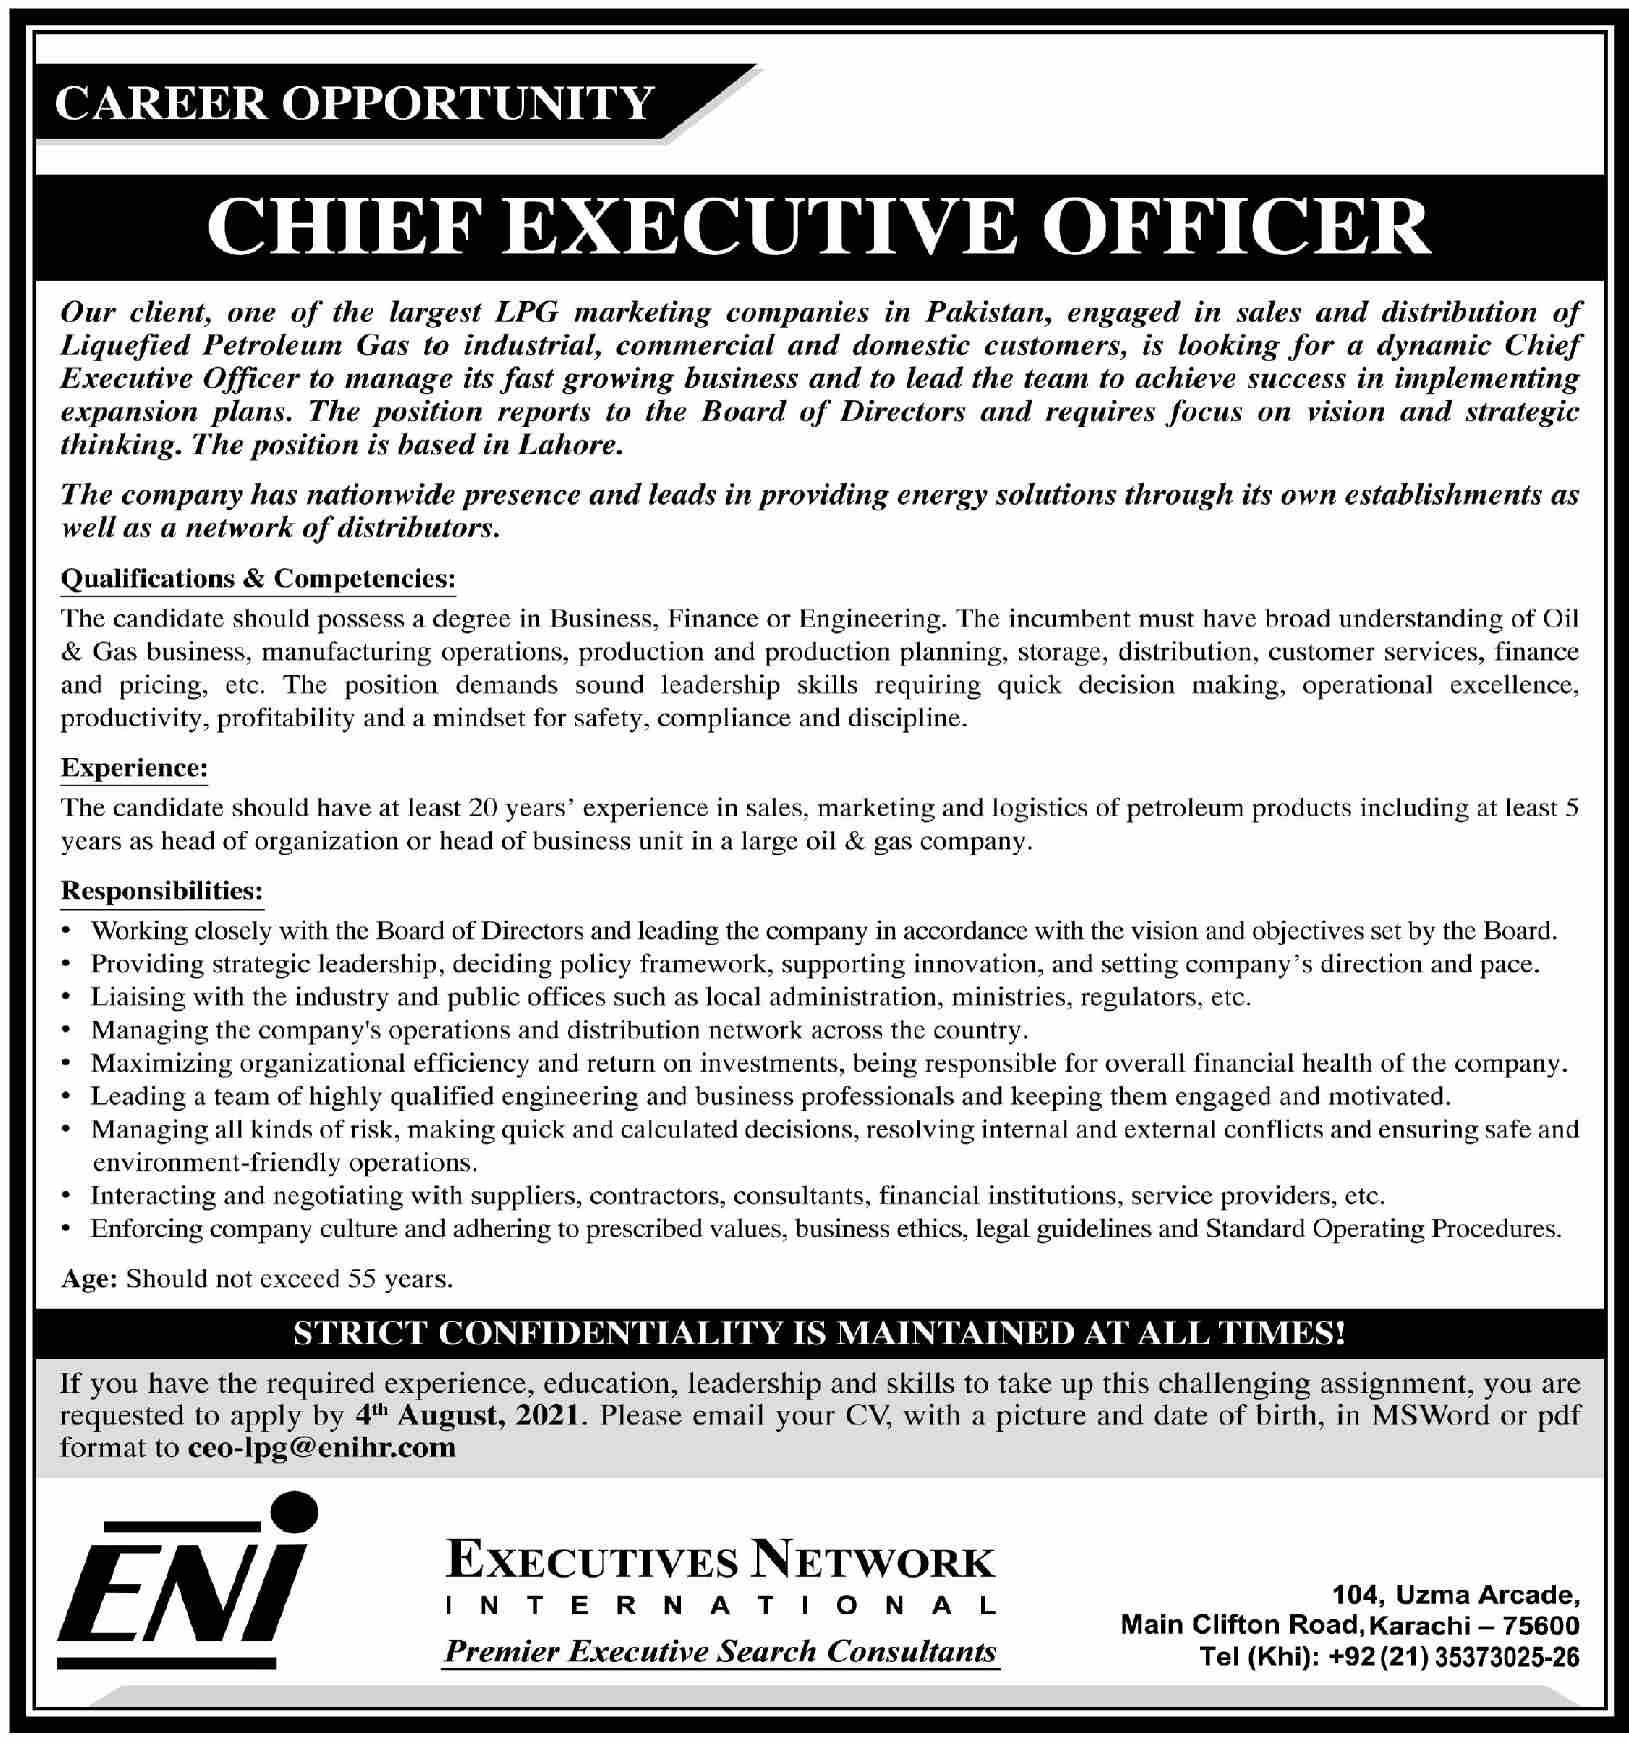 Jobs in Executive Network International